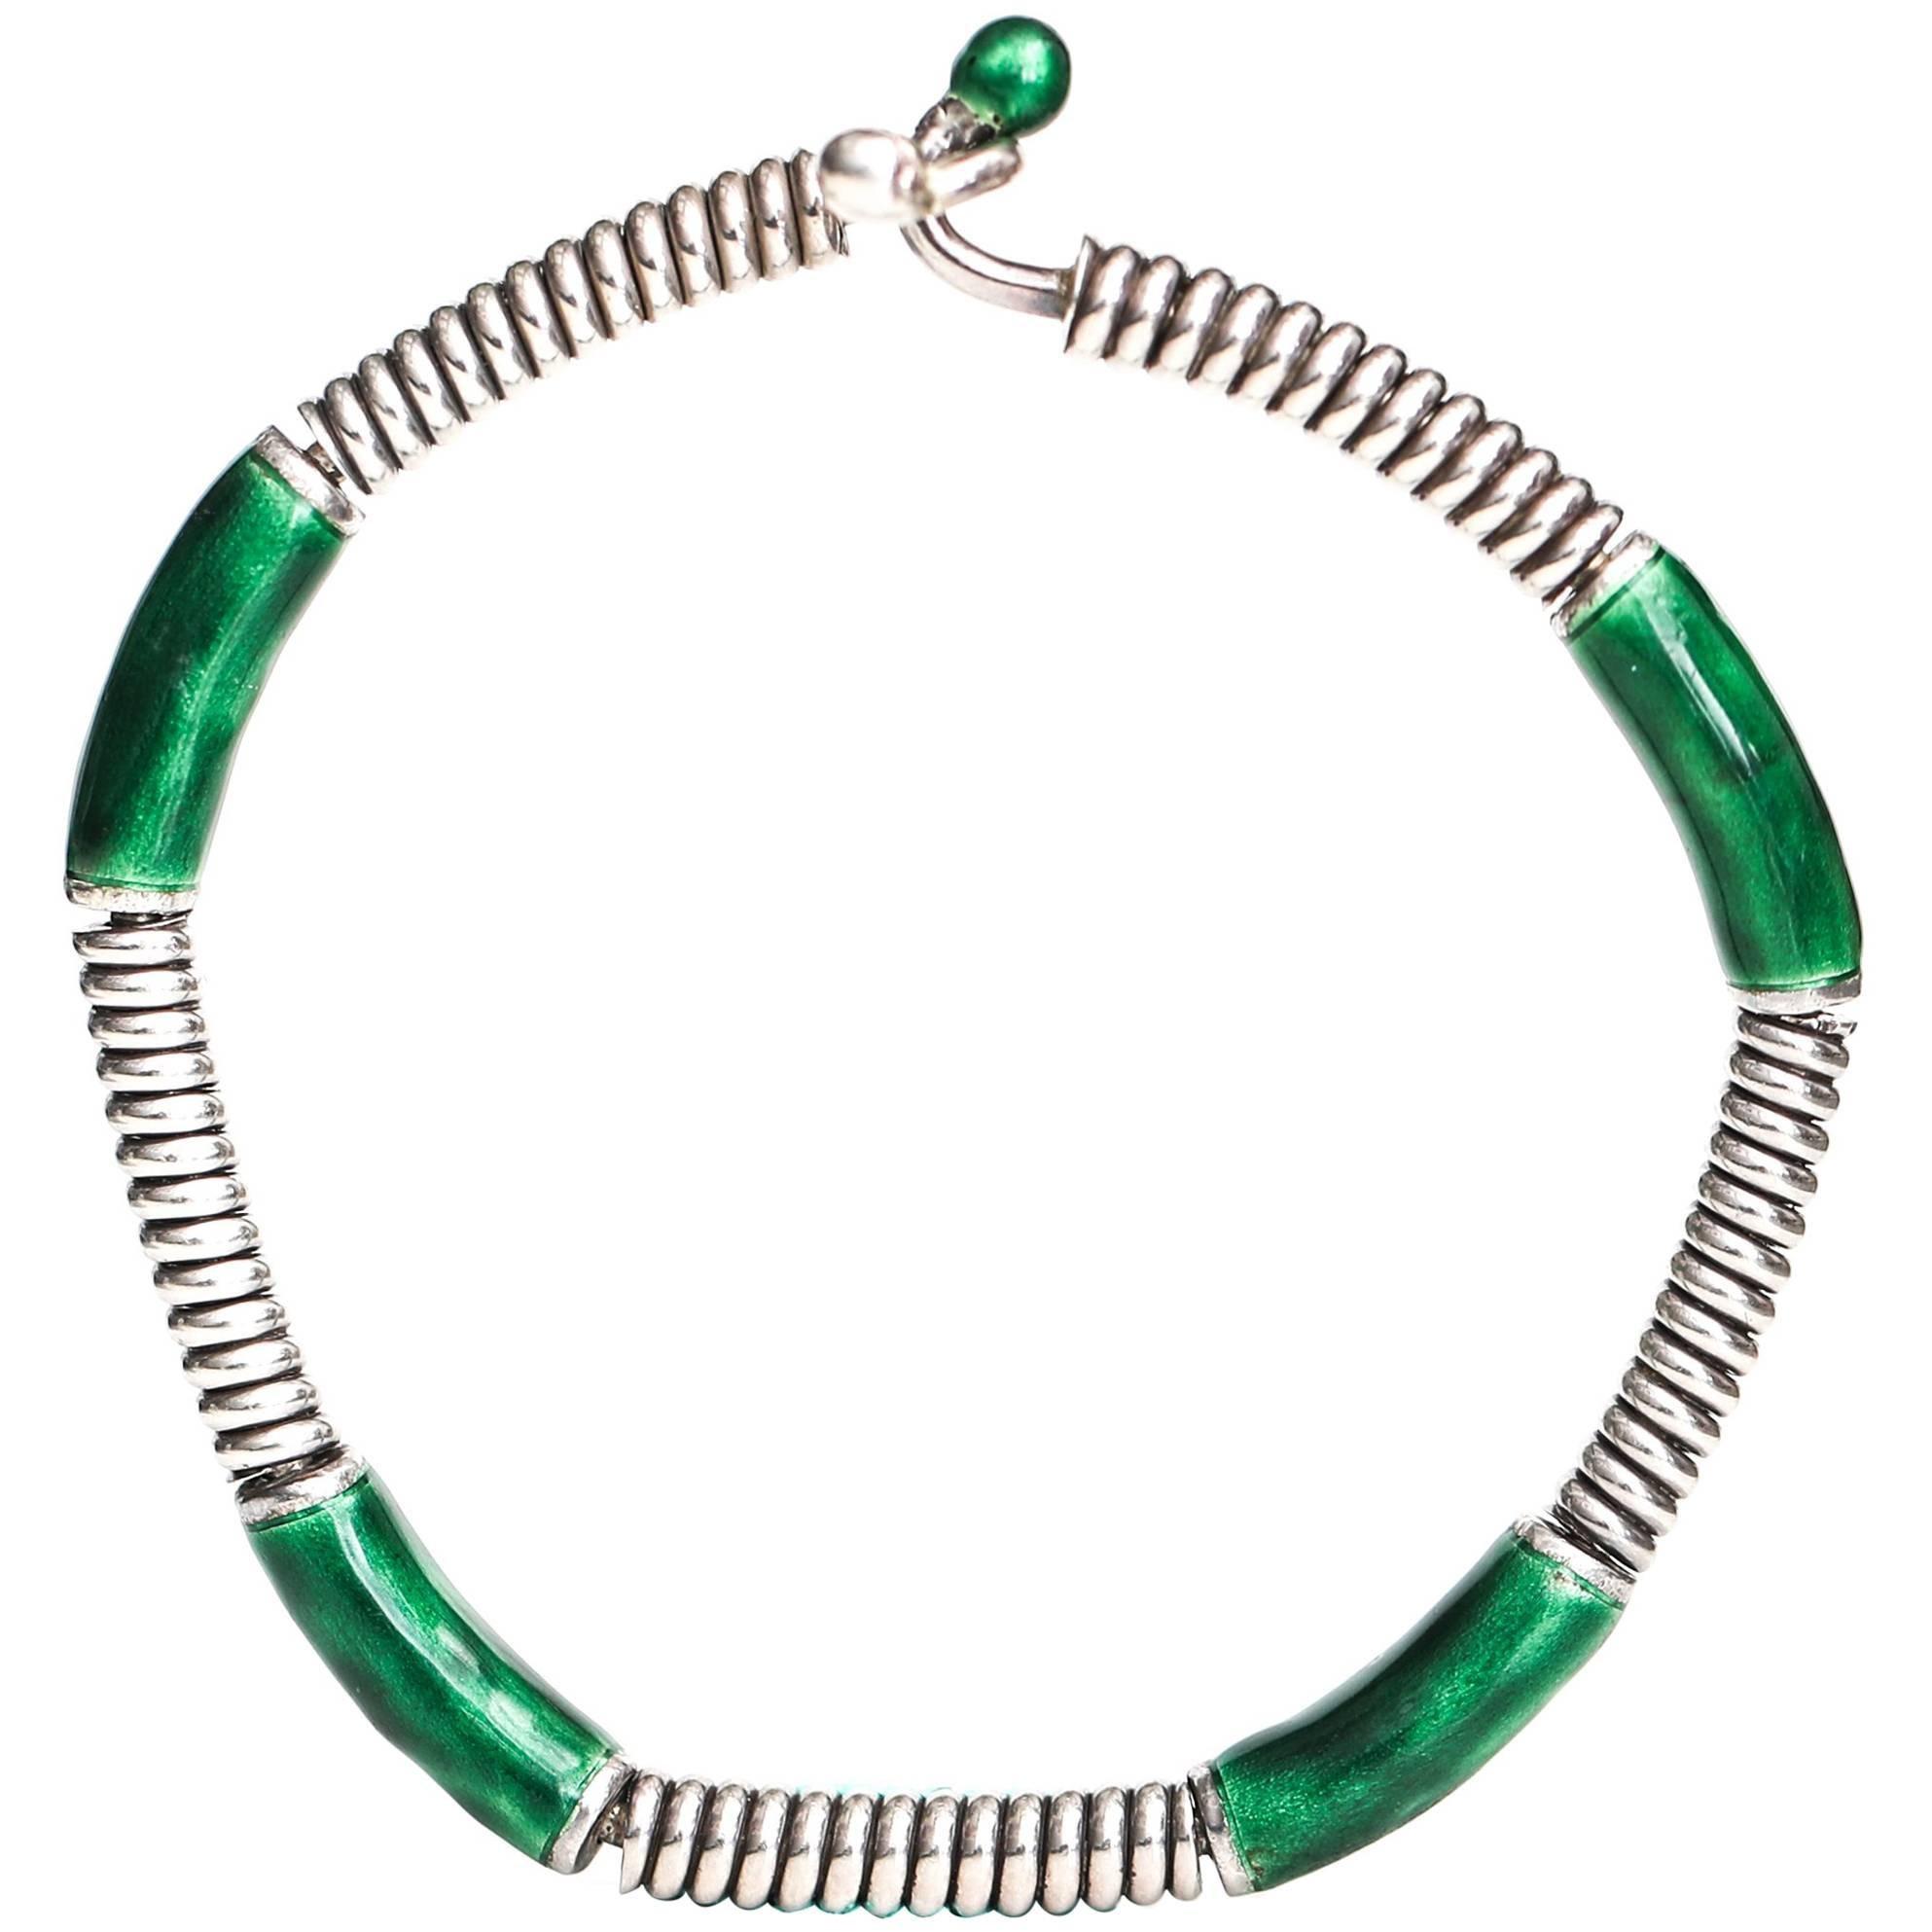 1980s Gucci Green Enamel Sterling Silver Bangle Bracelet